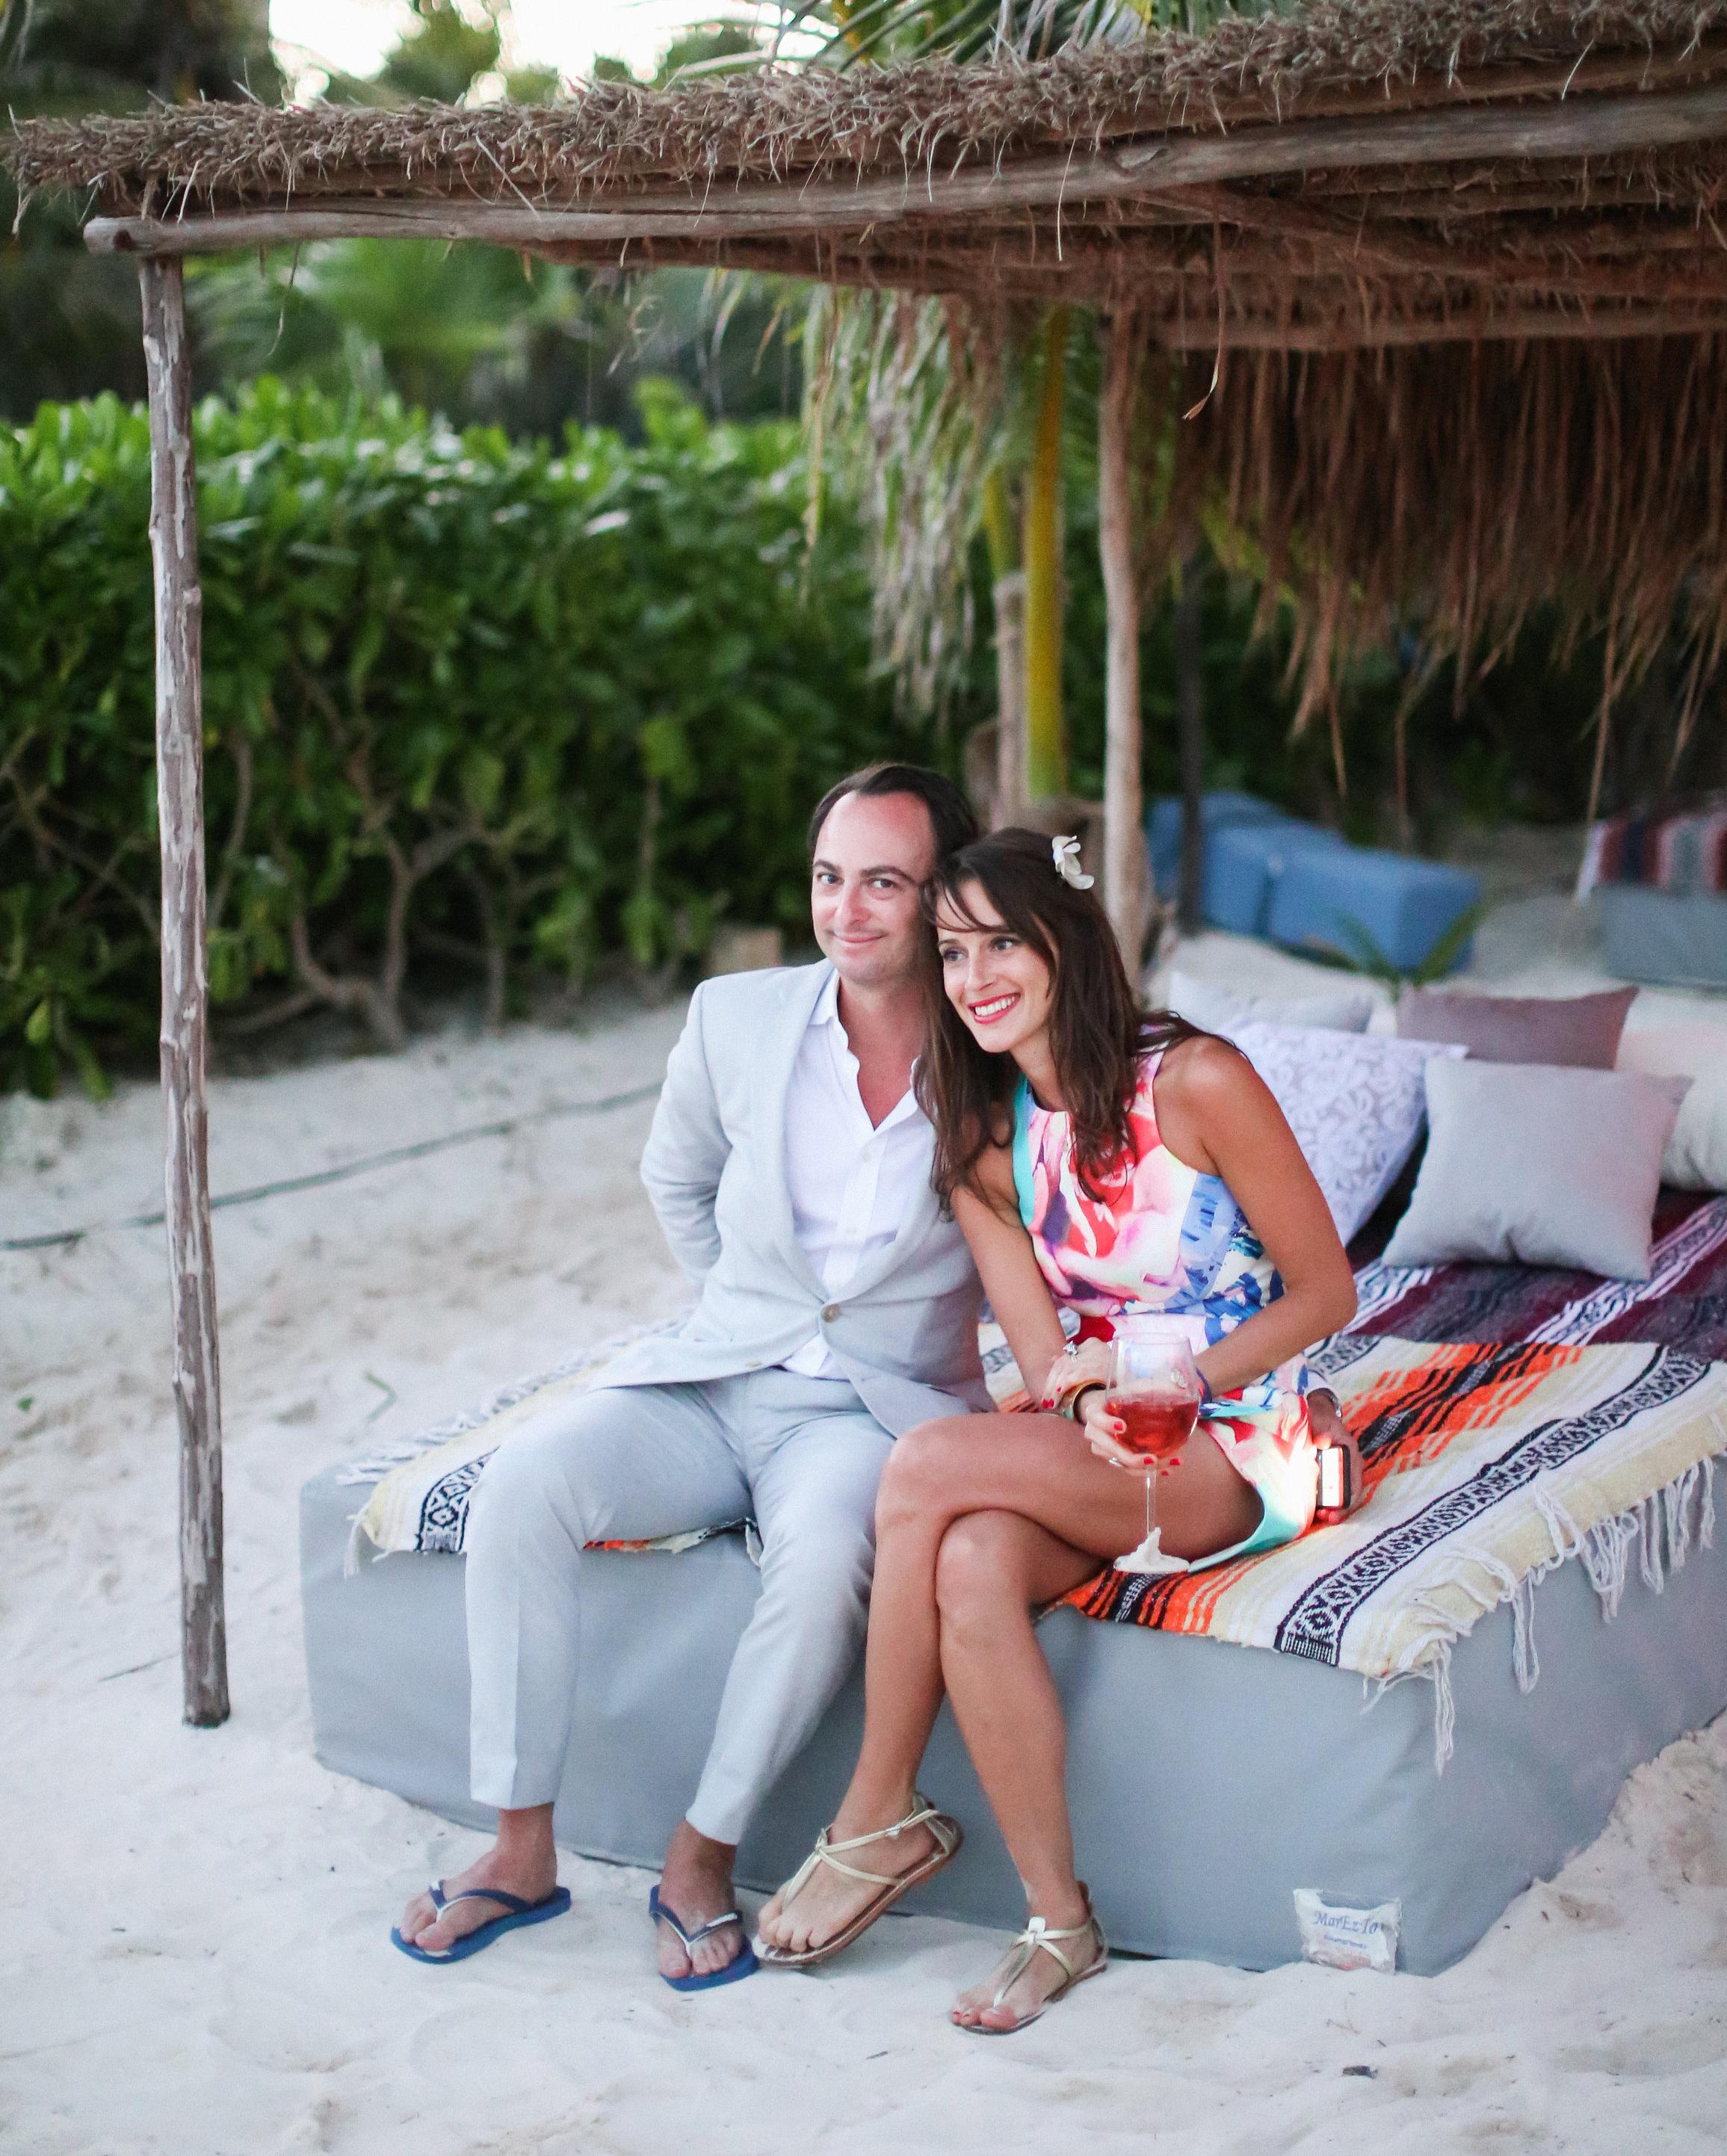 olivia-keith-wedding-guests-014-s112304-0815.jpg